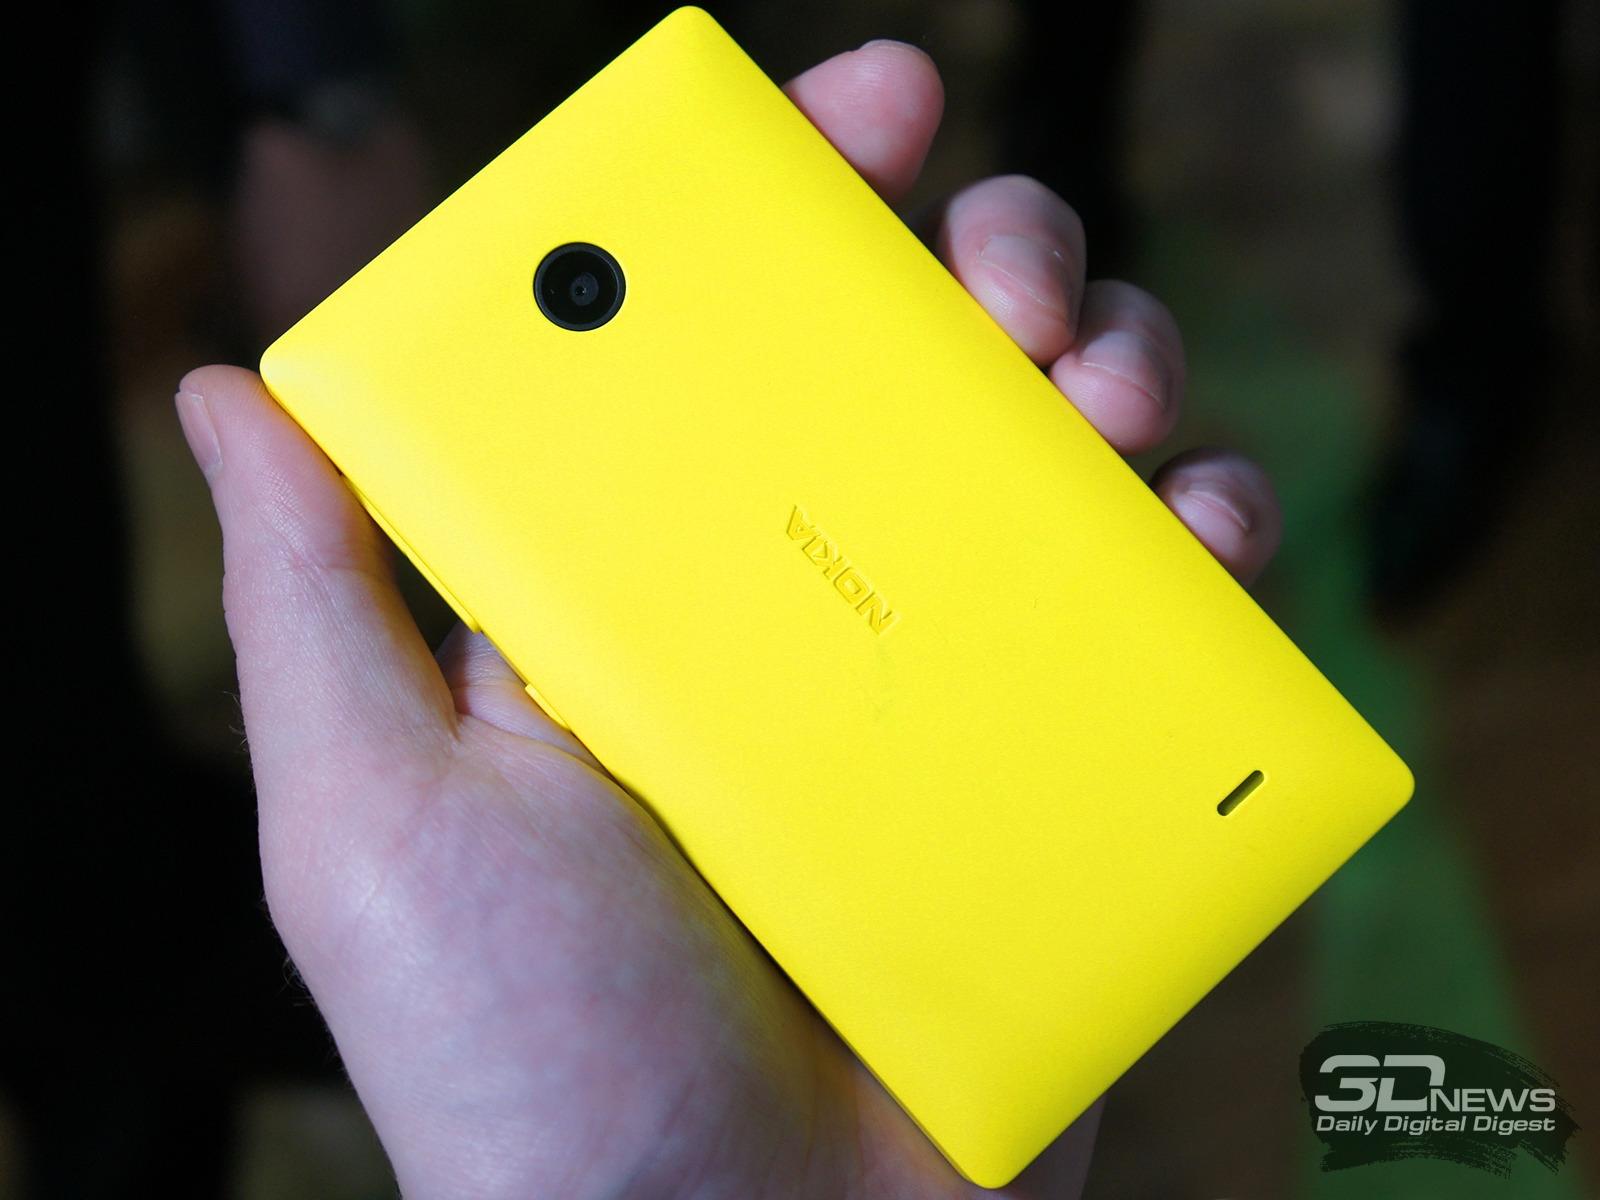 Mwc 2014 Nokia X Xl Yellow 5 800480 Ppi